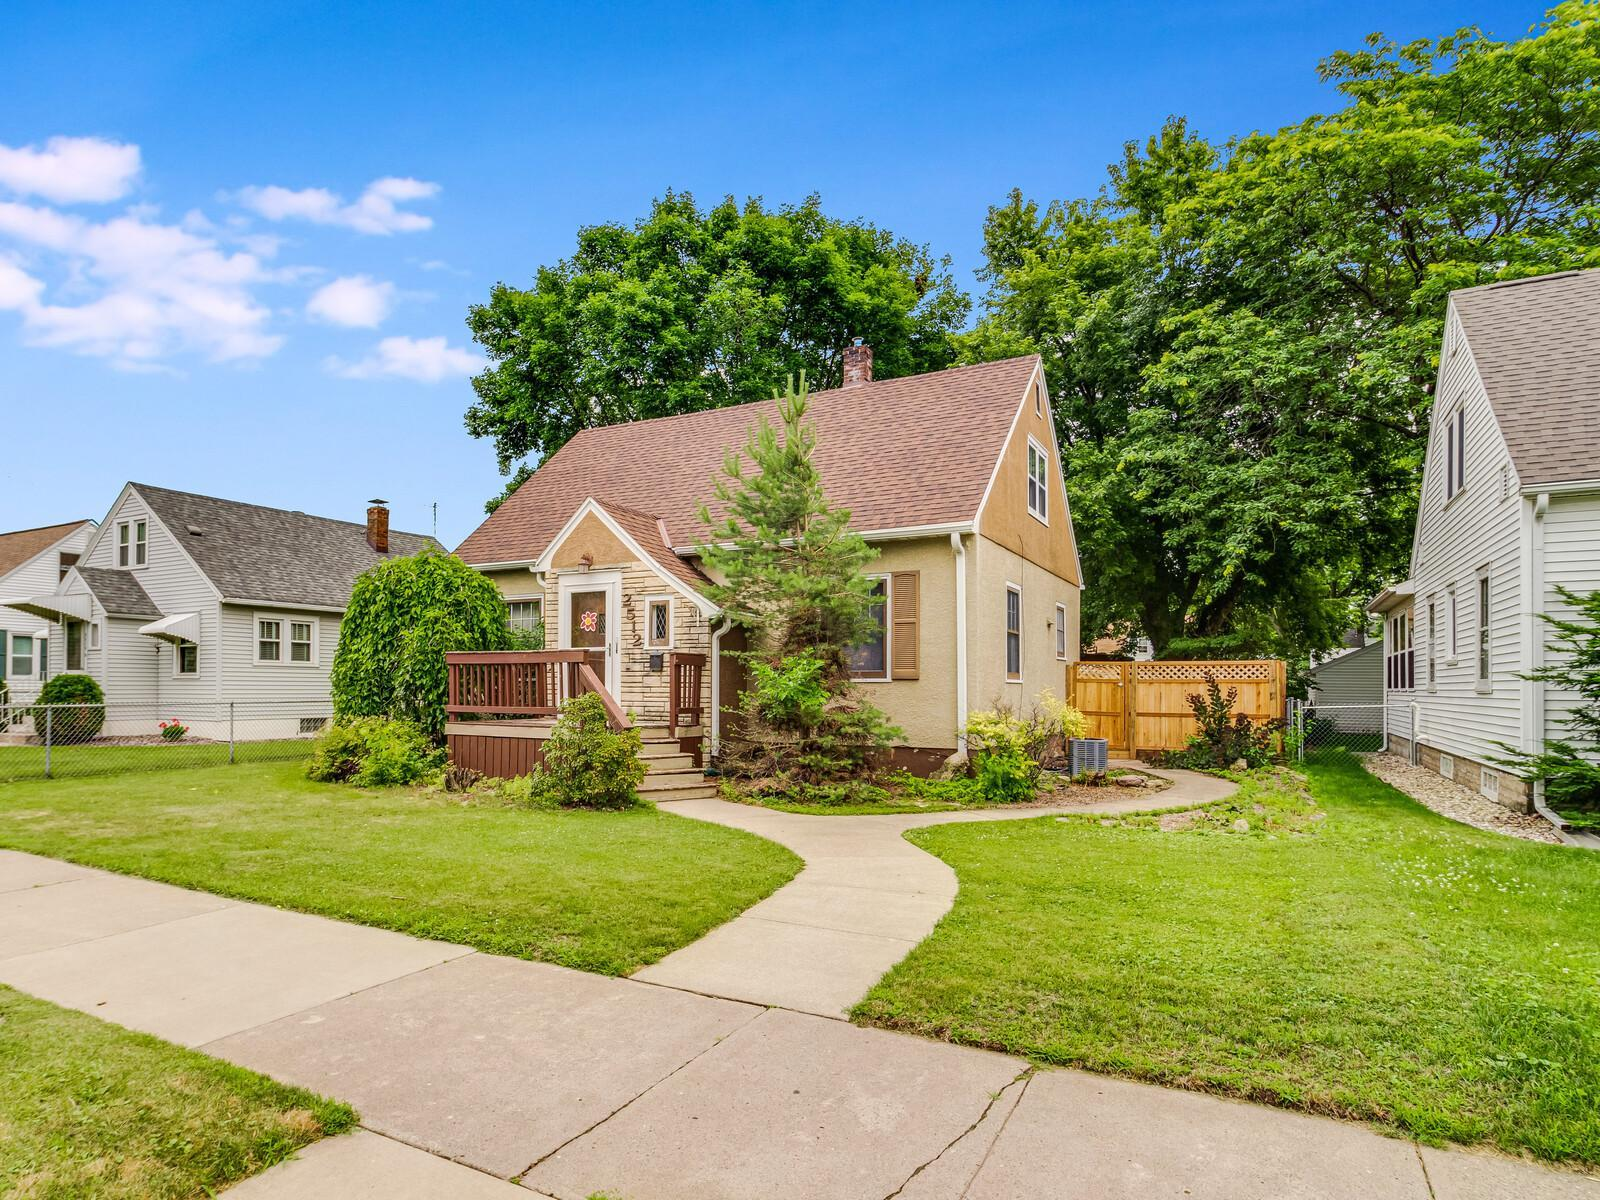 2512 Loomis Property Photo - La Crosse, WI real estate listing